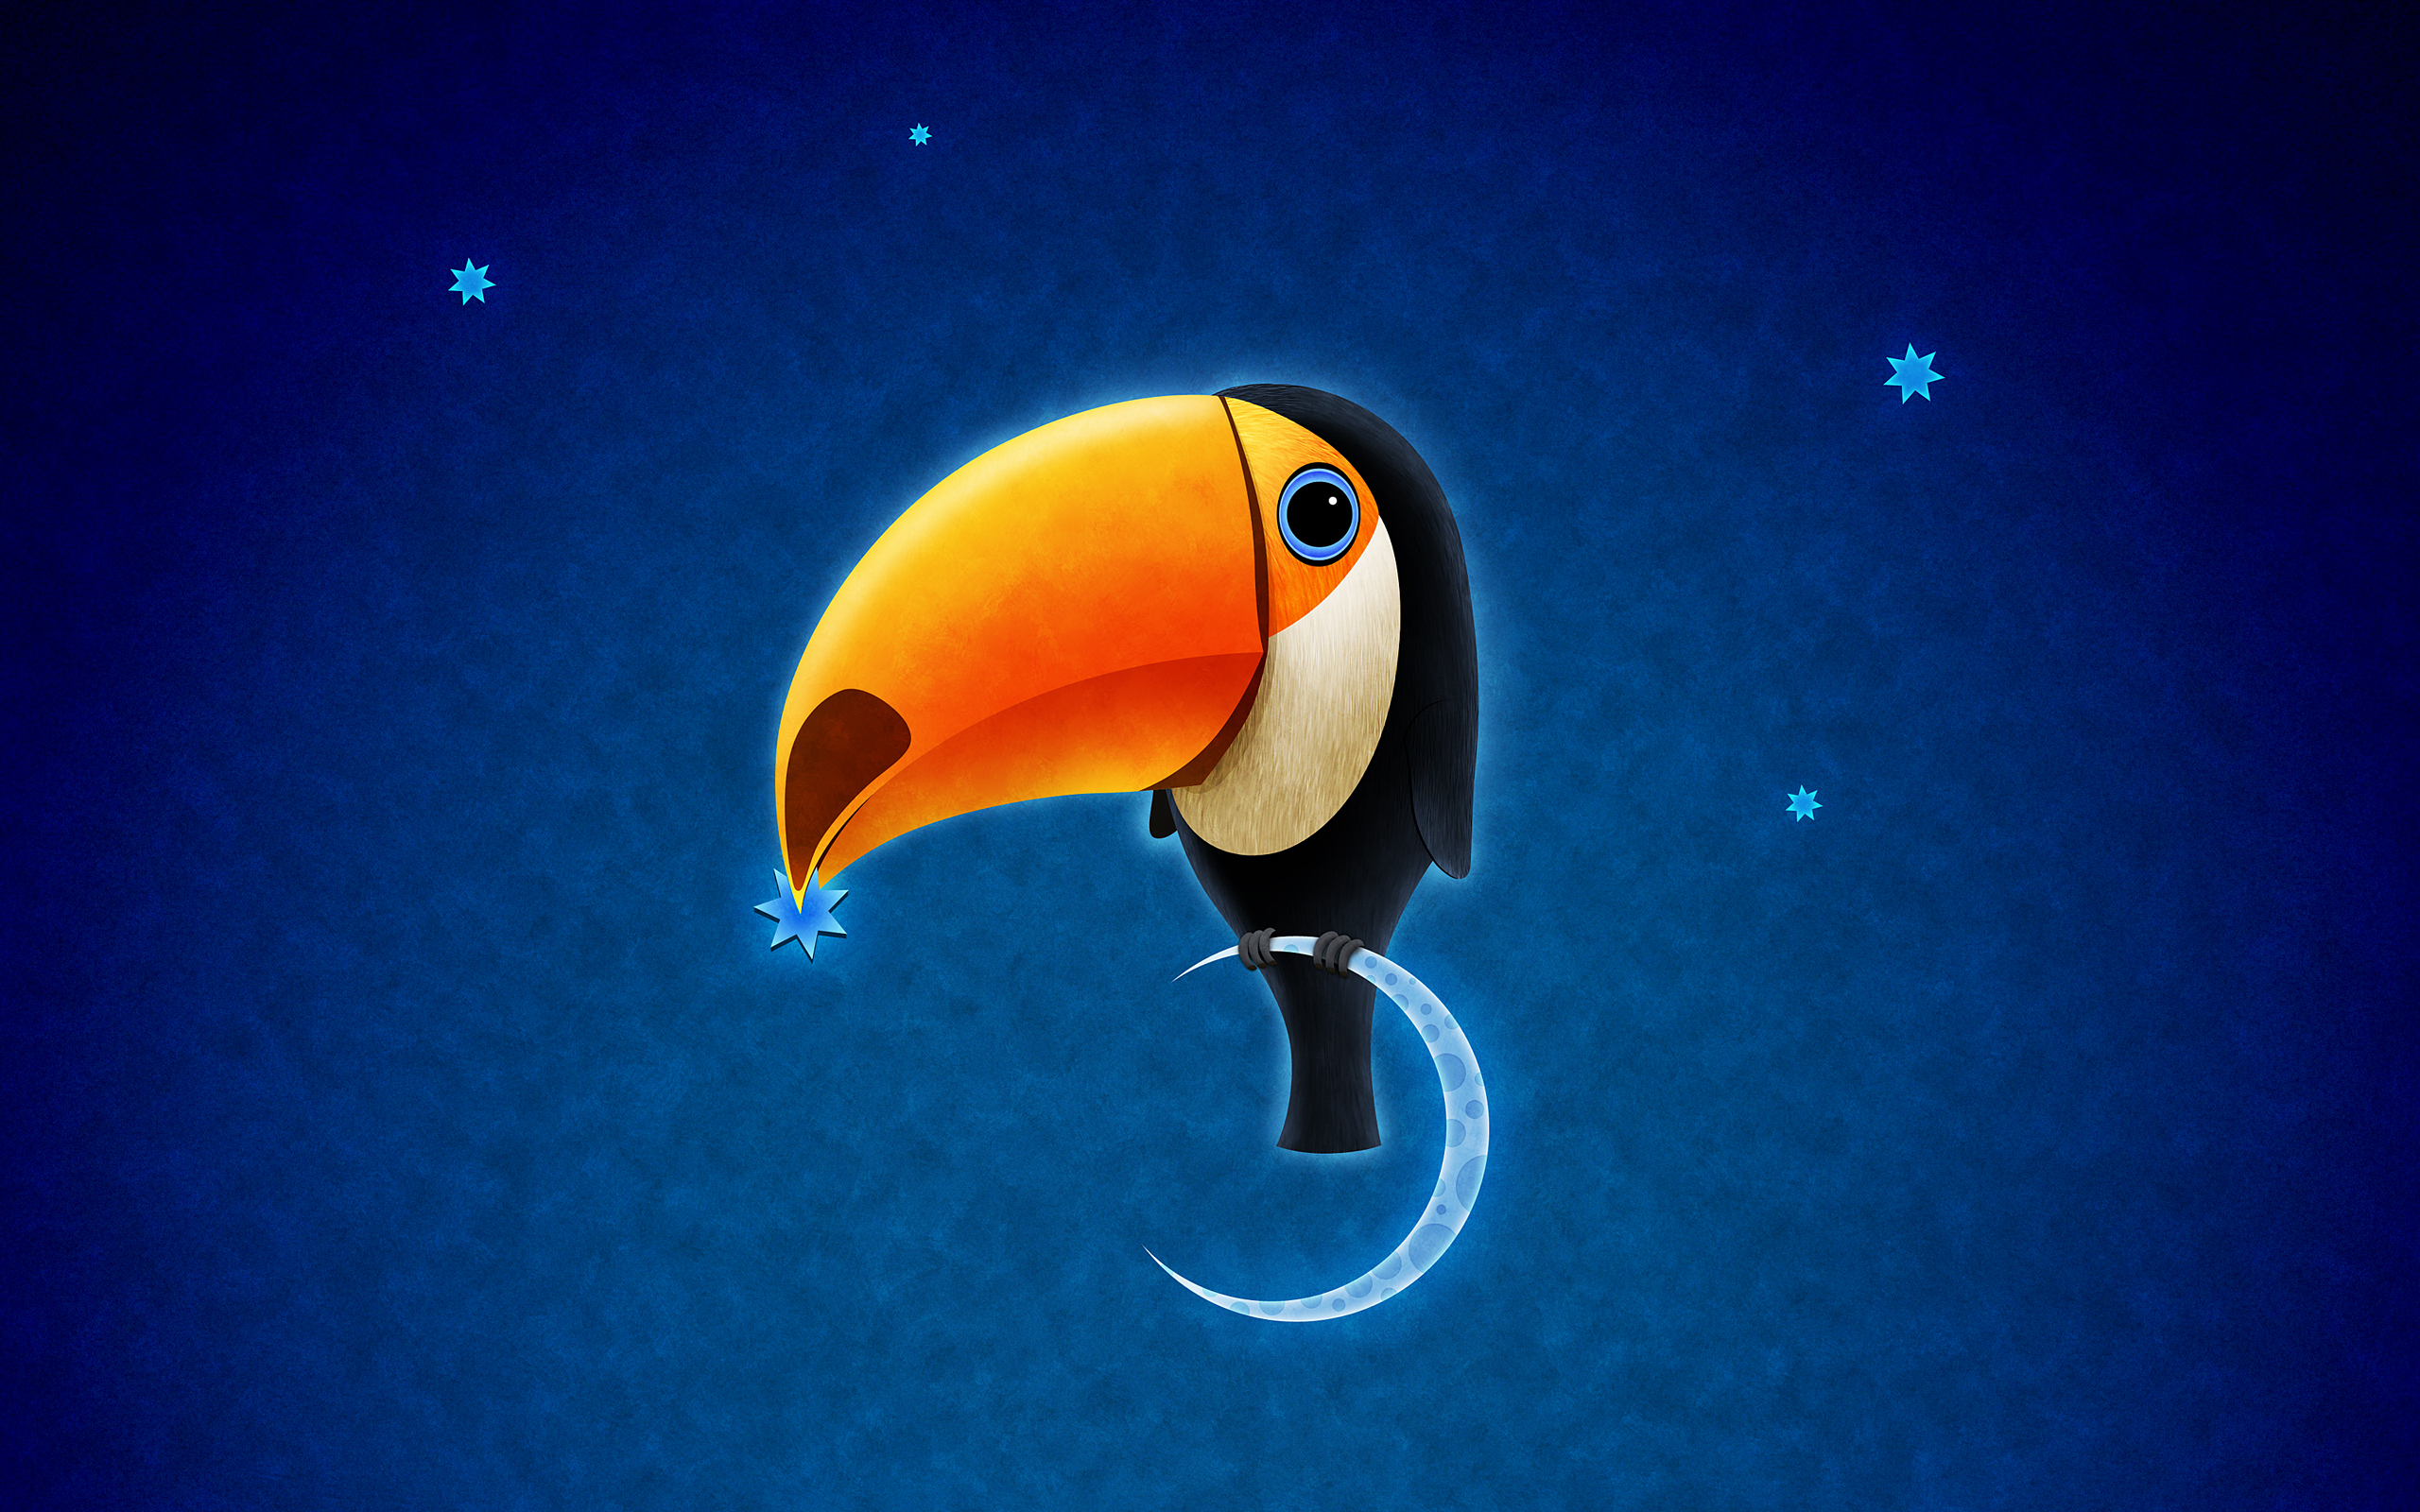 HD Wallpapers Toucan Bird